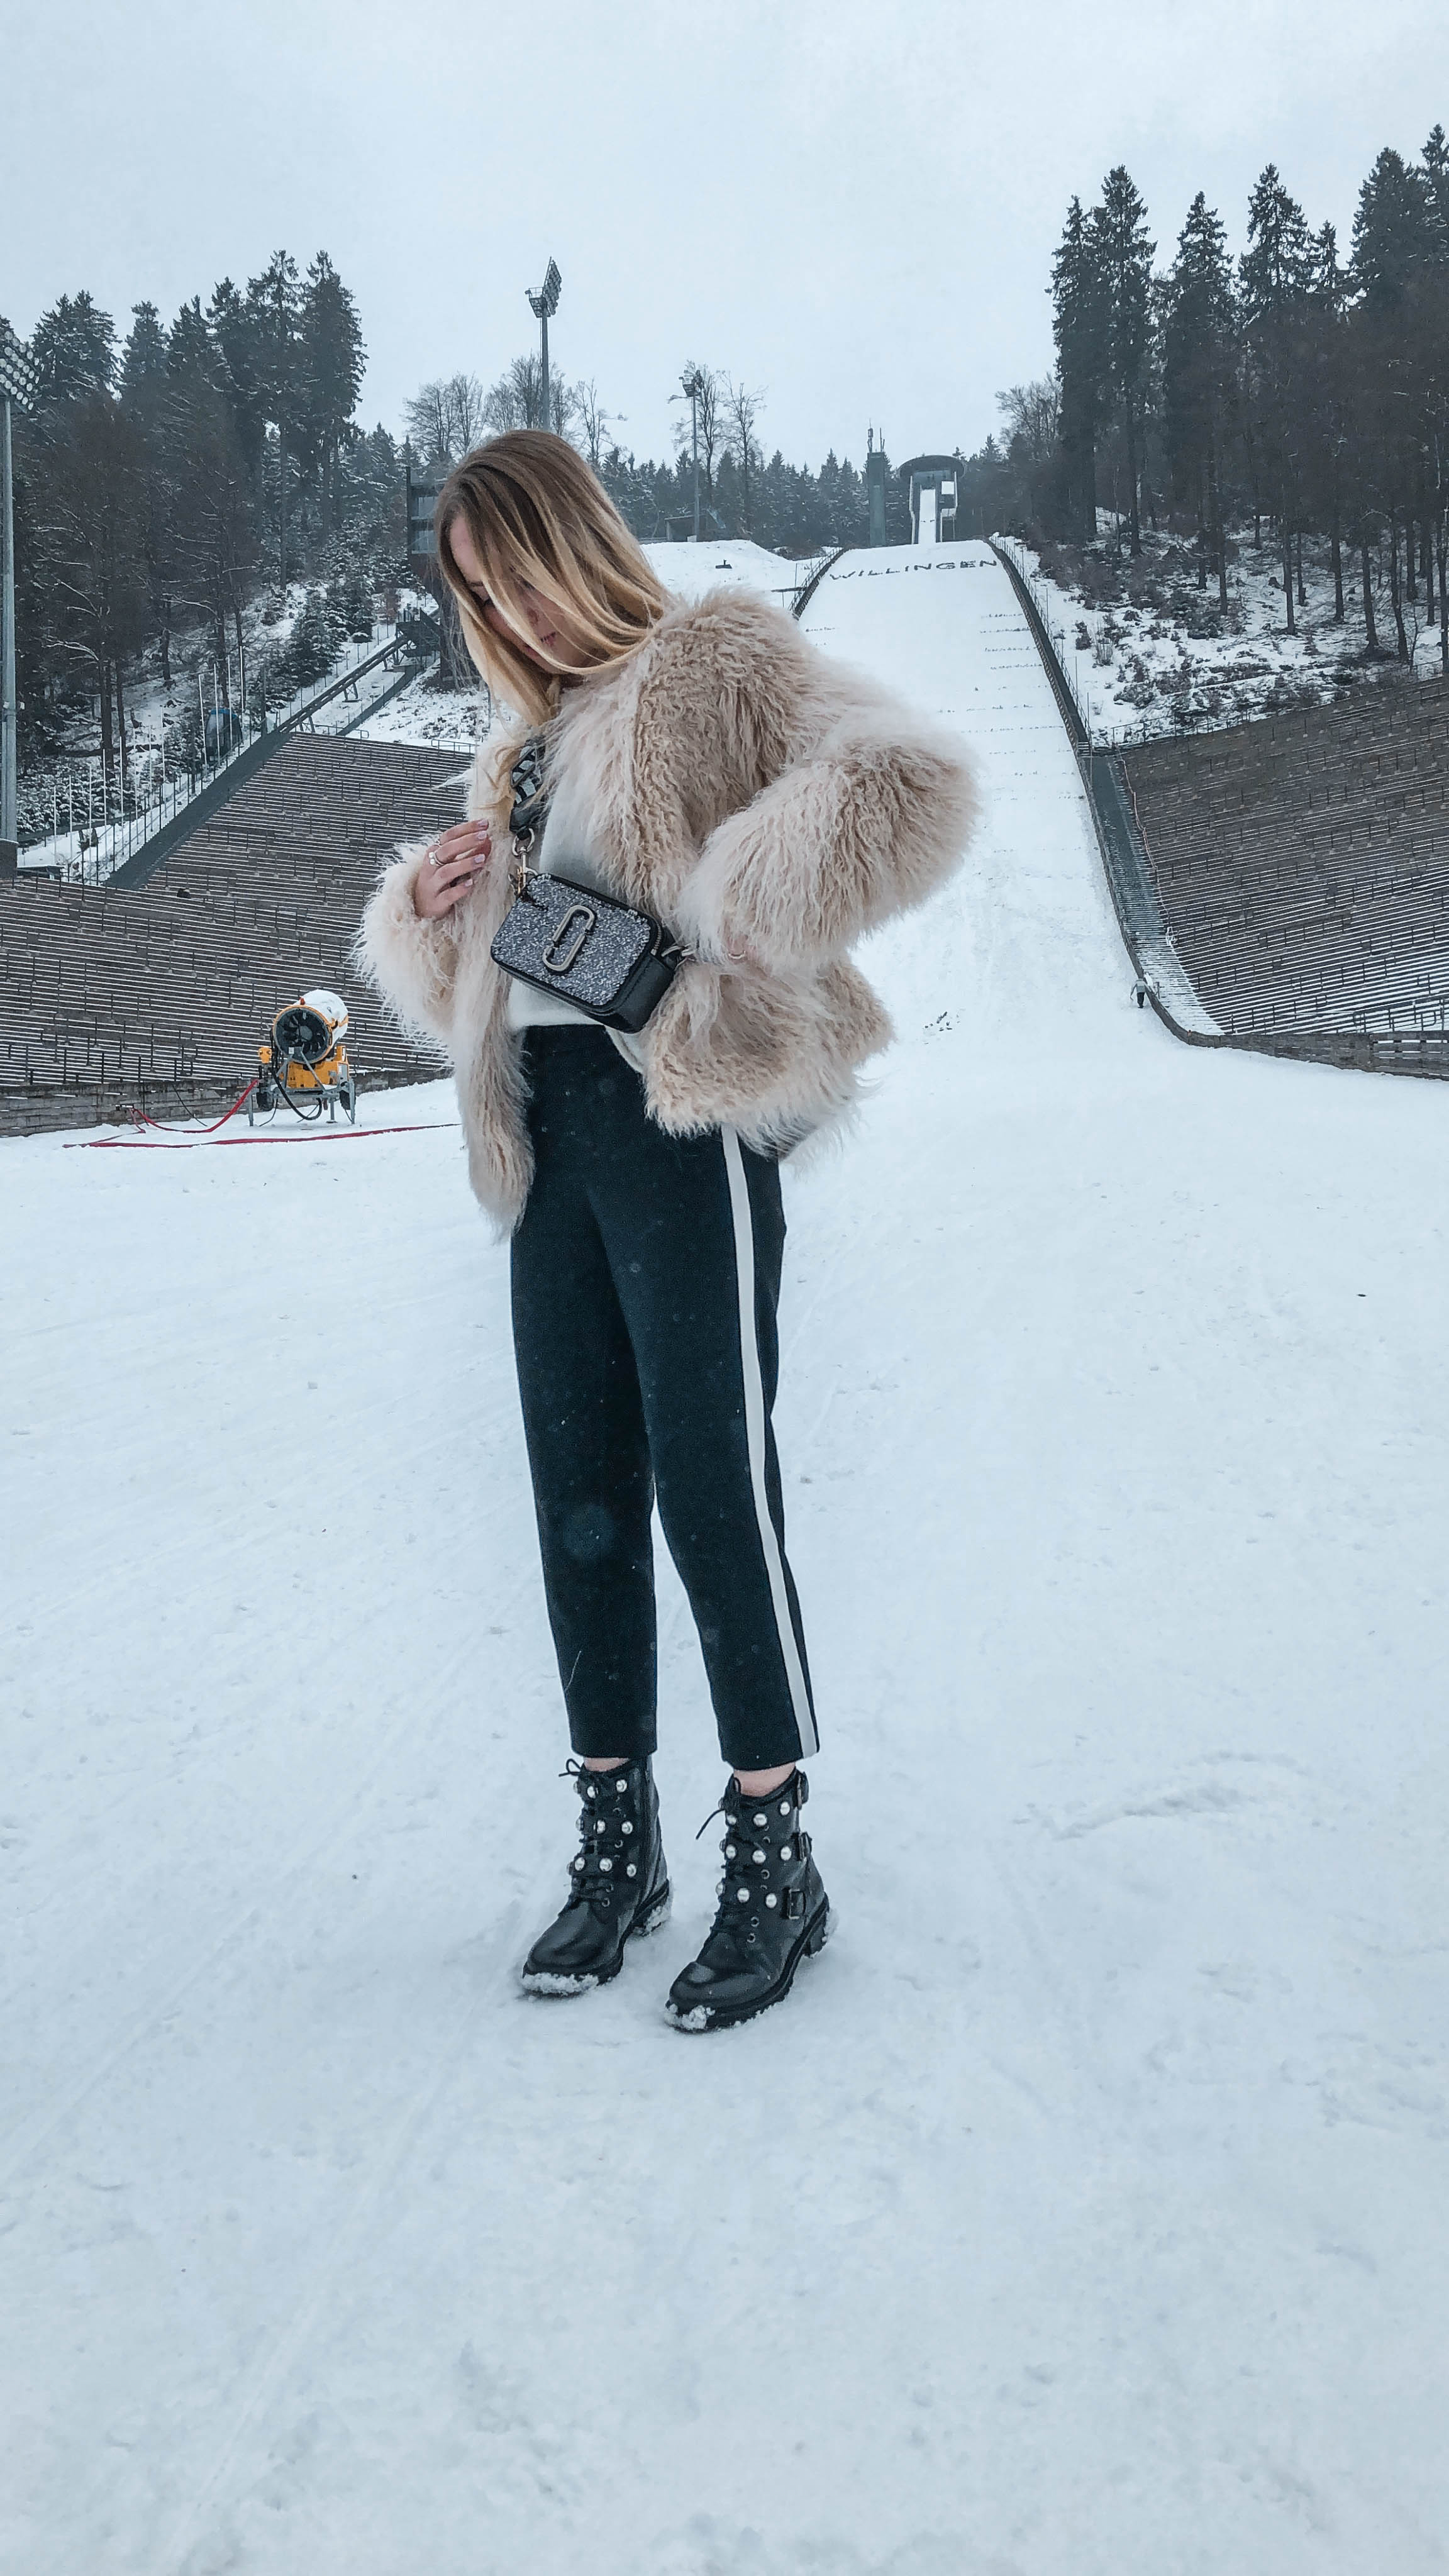 Winter Wonderland - Faux Fur Look - KIM ENGEL